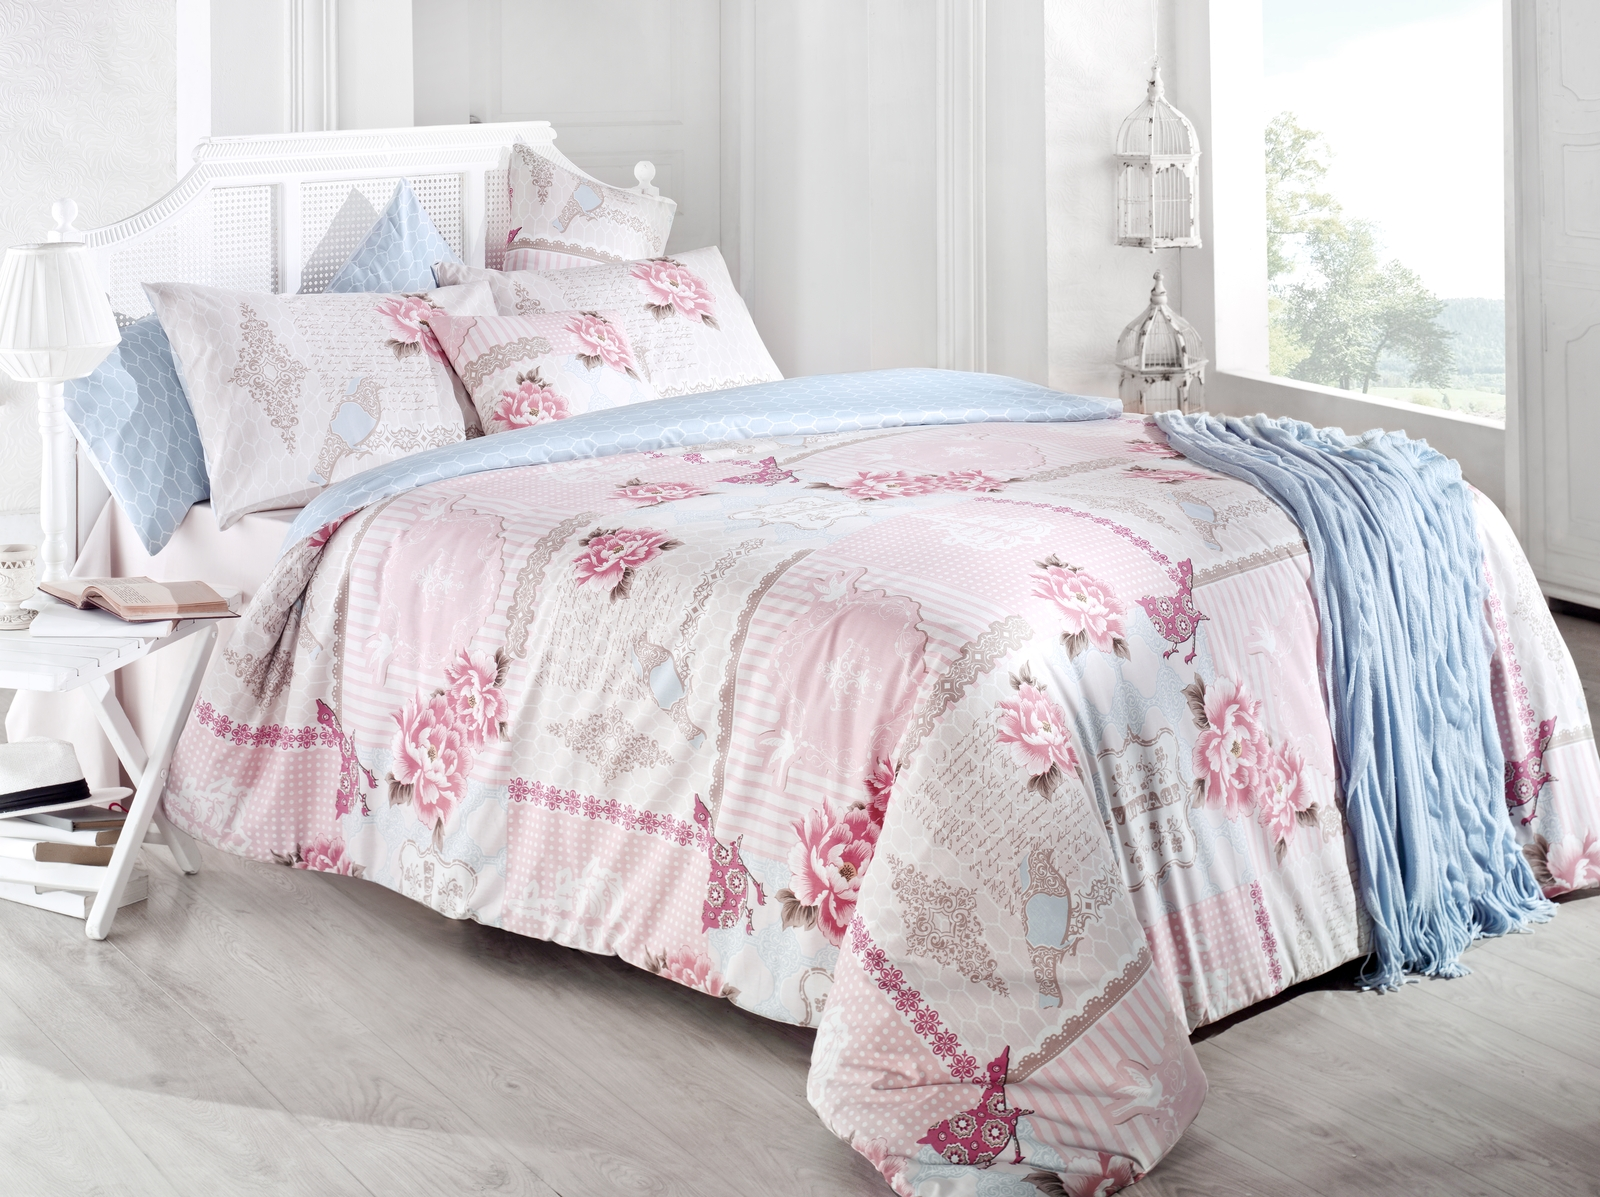 цена на Комплект белья Issimo Home Pastoral, евро, наволочки 50x70, цвет: розовый